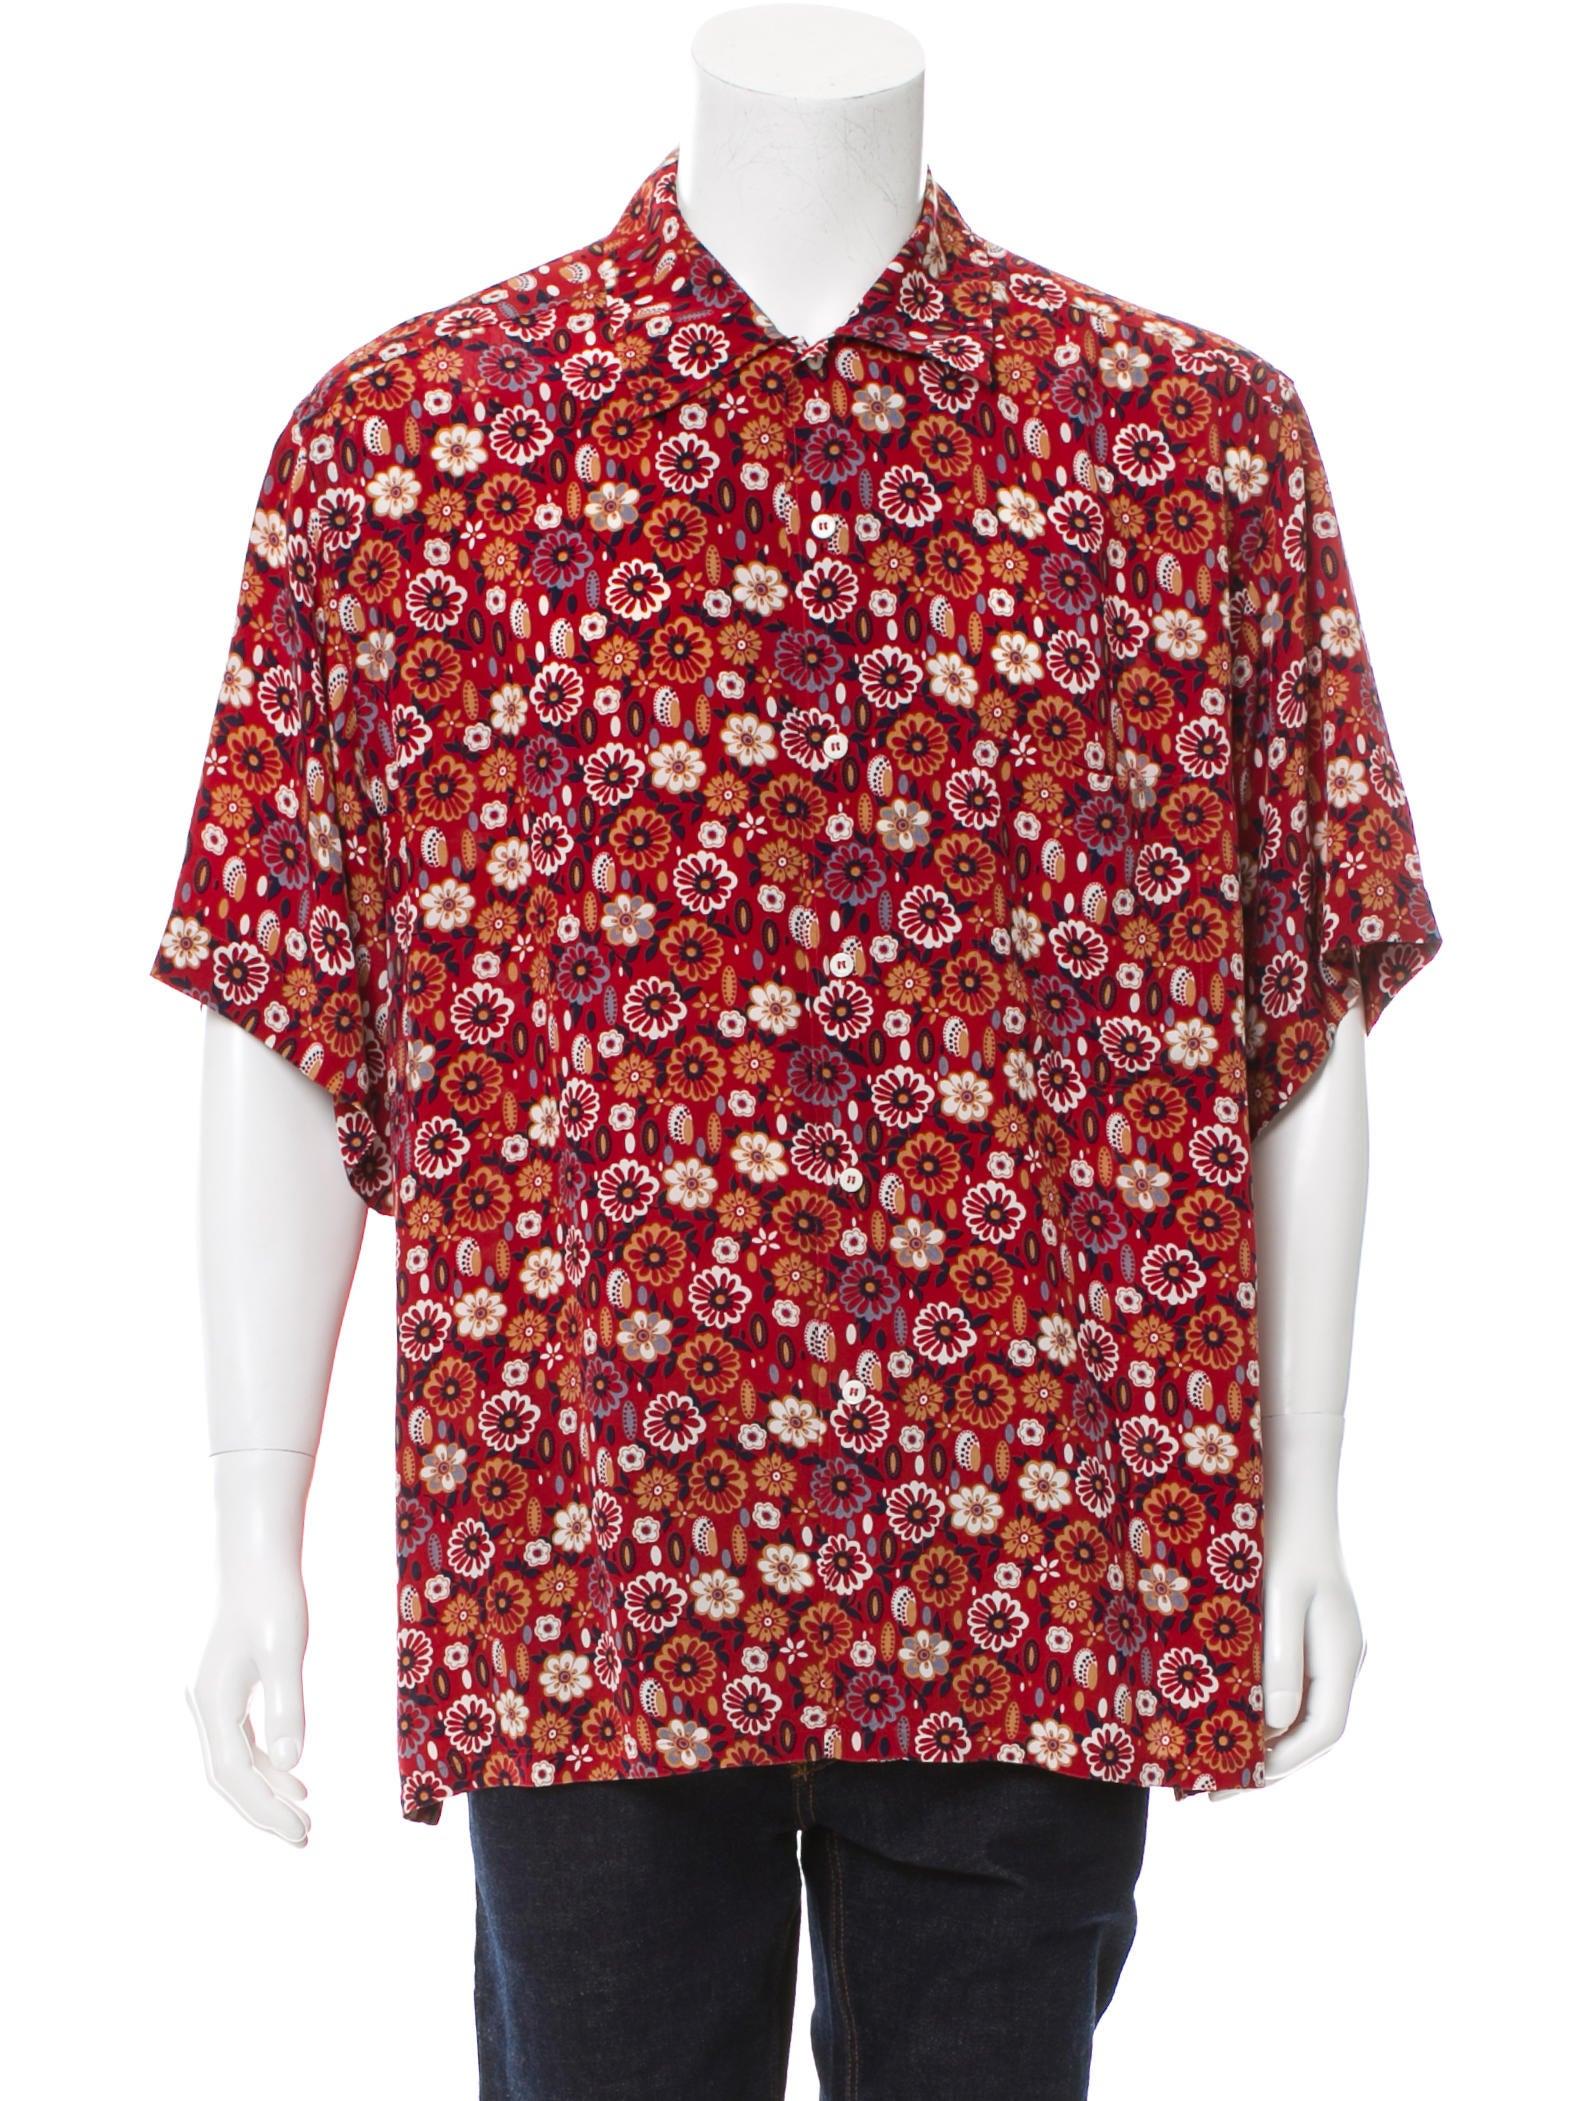 Brioni floral print button up shirt clothing bro21832 for Floral print button up shirt